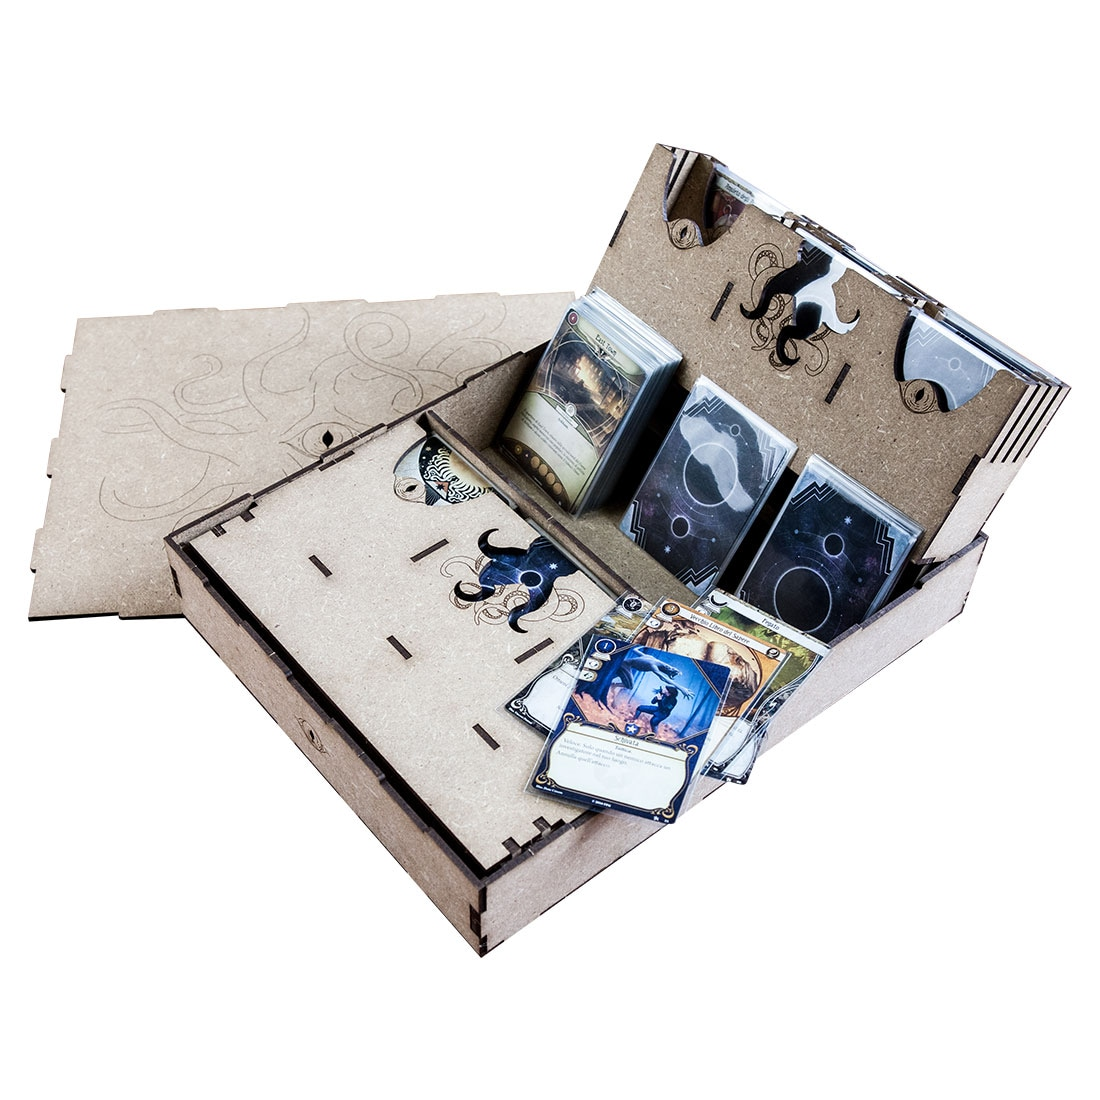 Arkham Horror LCG - Storage System (Medium) Organizer - 3